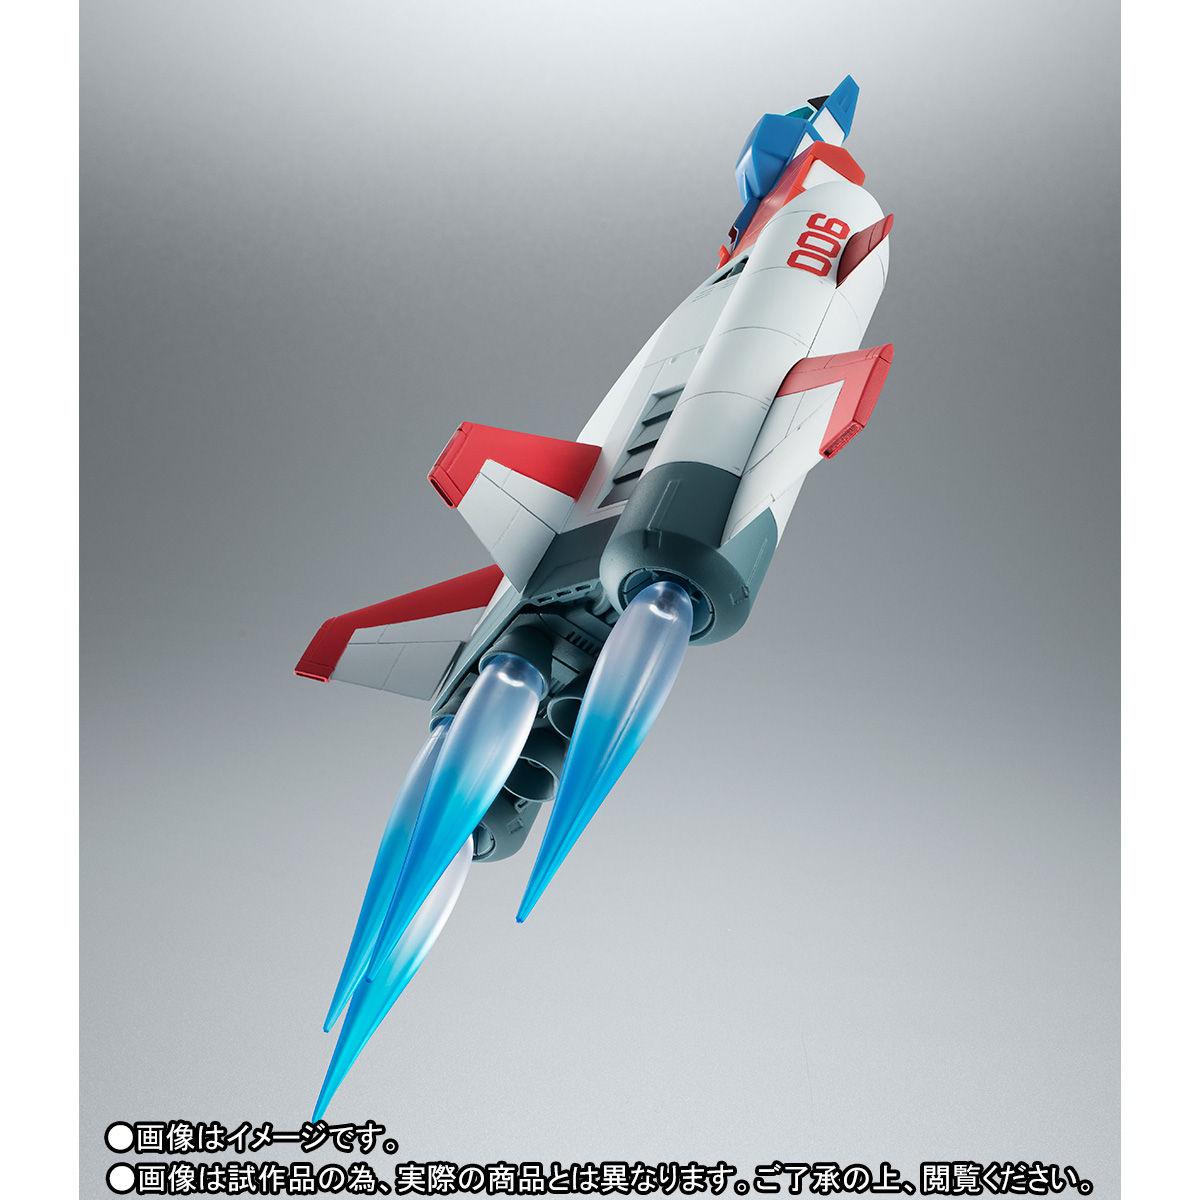 ROBOT魂〈SIDE MS〉『FF-X7-Bst コア・ブースター 2機セット ver. A.N.I.M.E. ~スレッガー005 & セイラ006~』機動戦士ガンダム 可動フィギュア-006